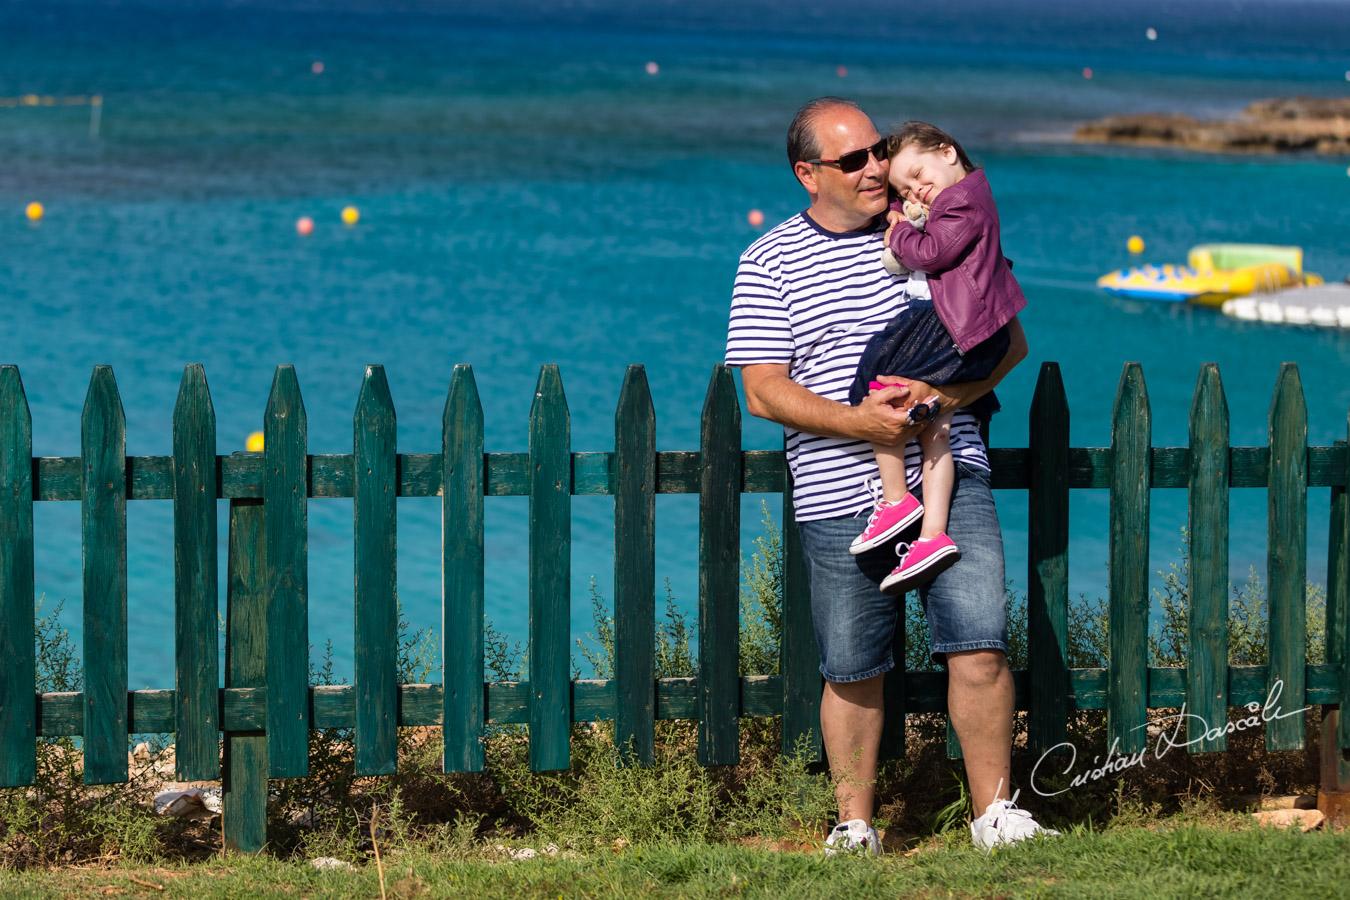 A Family Photo Shoot in Protaras, Cyprus - 04